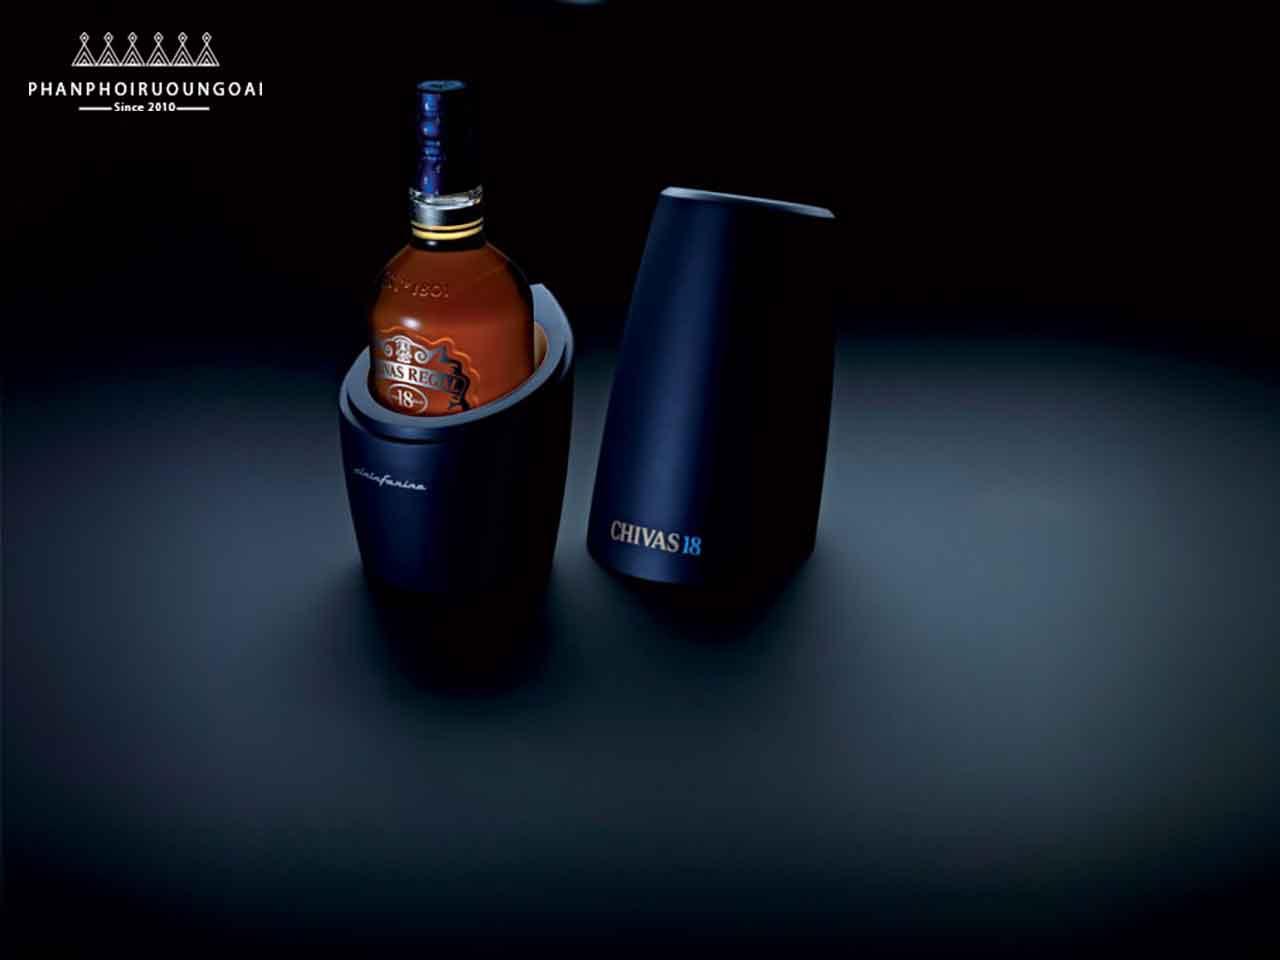 Hộp rượu Chivas 18 Pininfarina Level 1